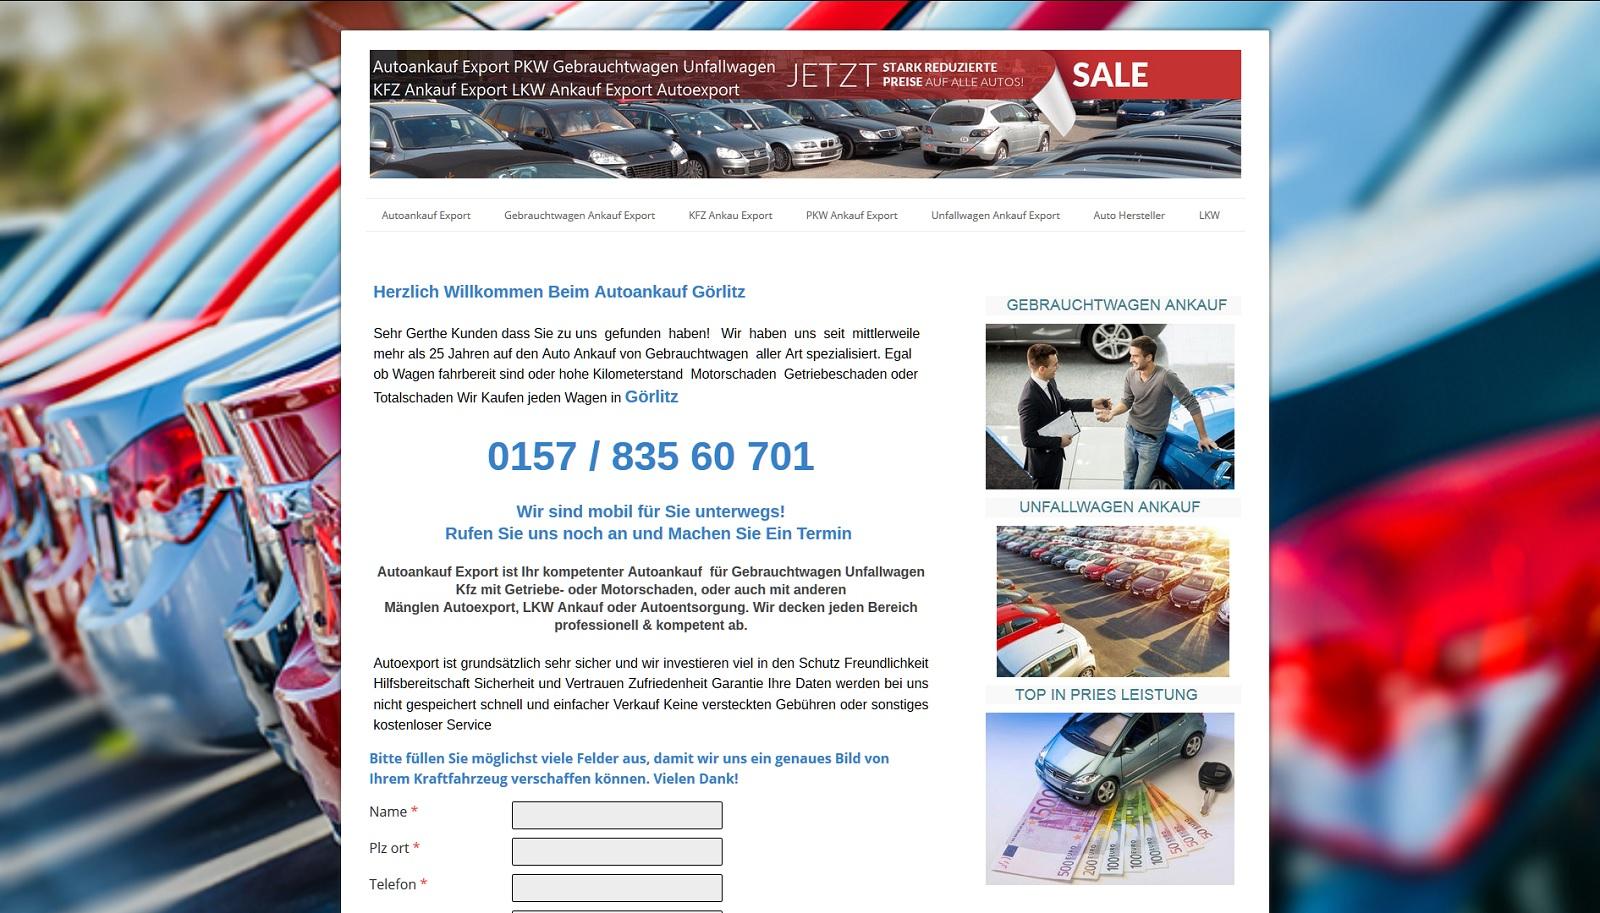 auto-ankauf-export.de - Autoankauf Frechen